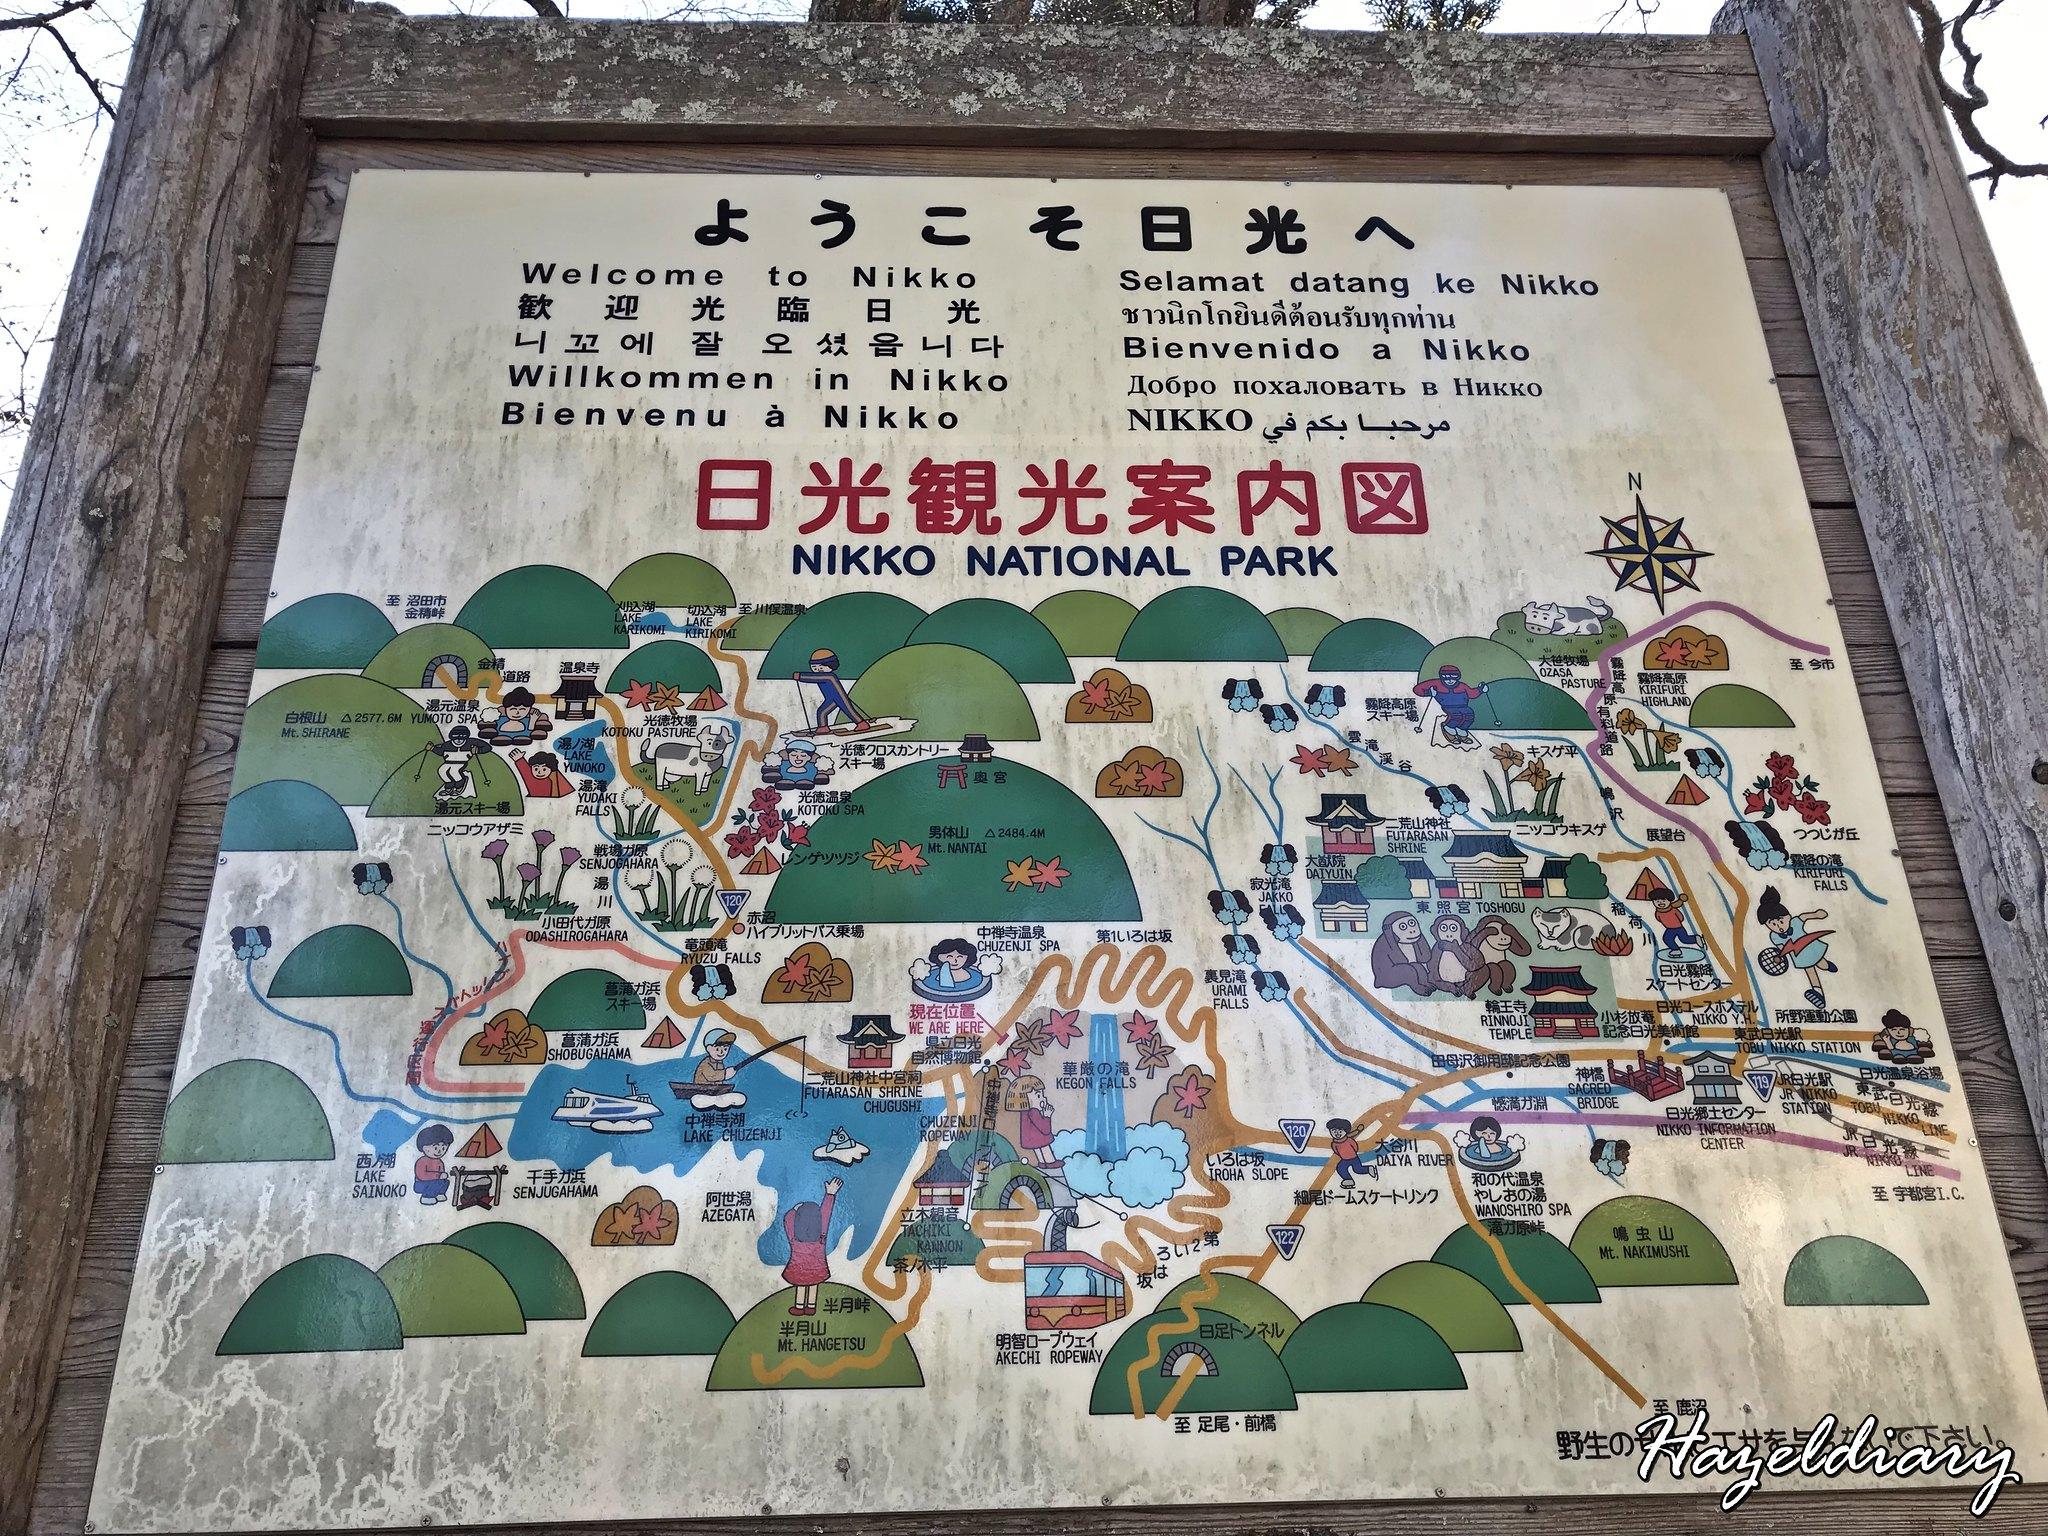 Nikko Tokyo-National Park